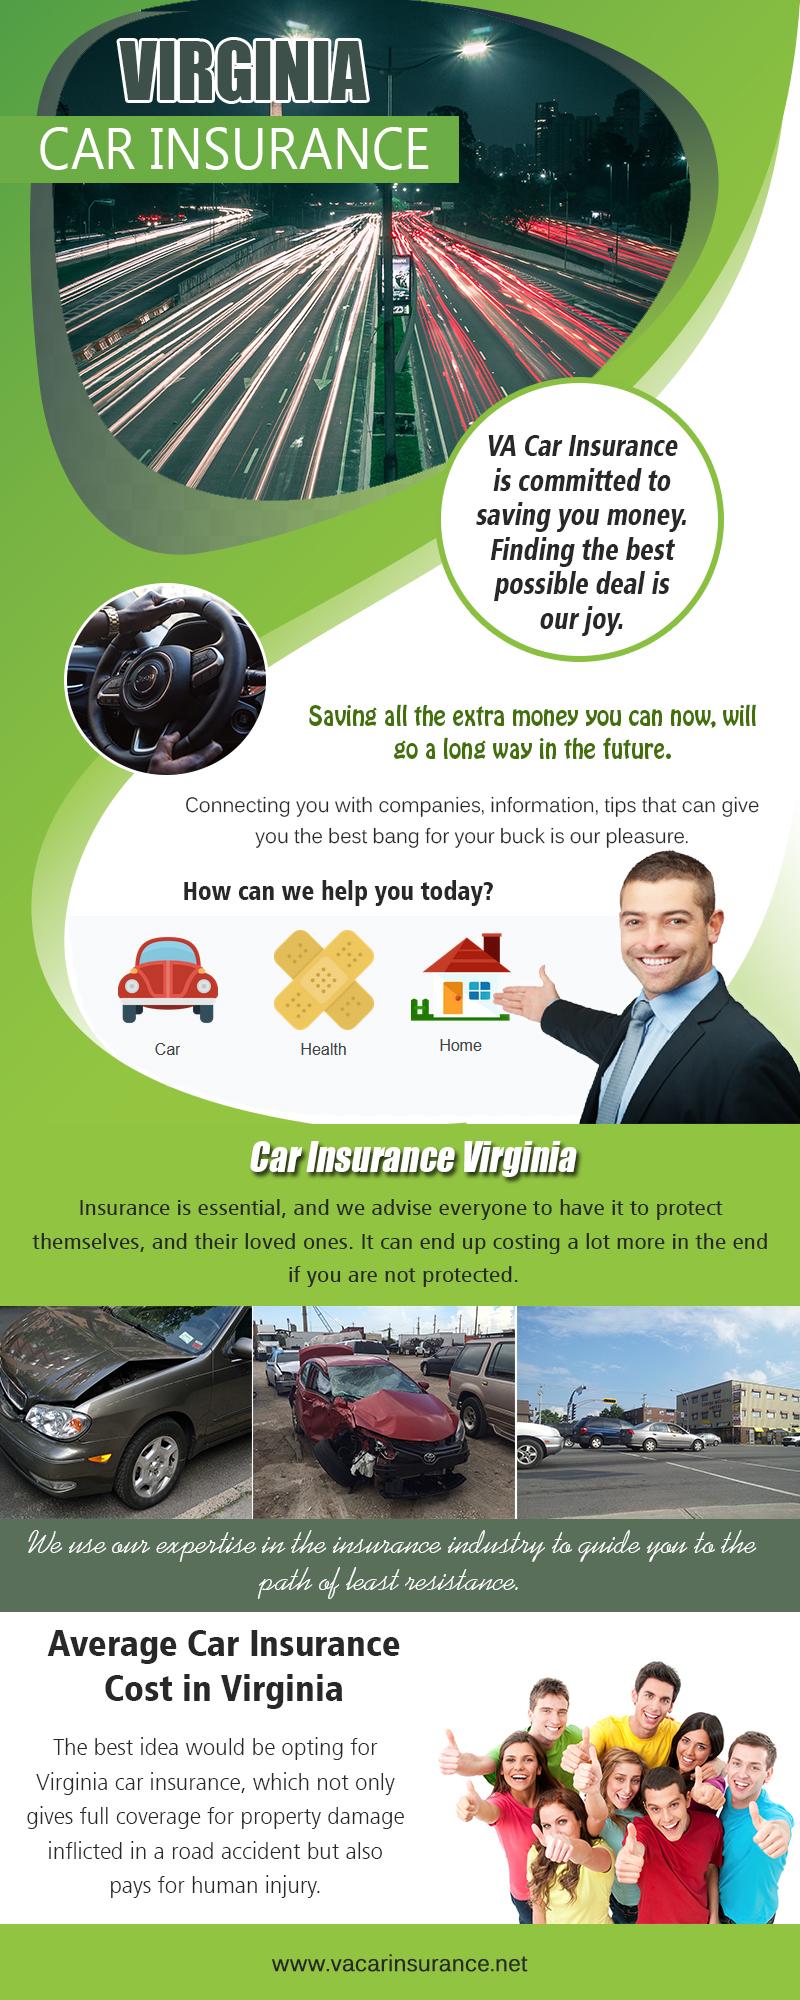 Average Car Insurance Cost In Virginia | vacarinsurance.net